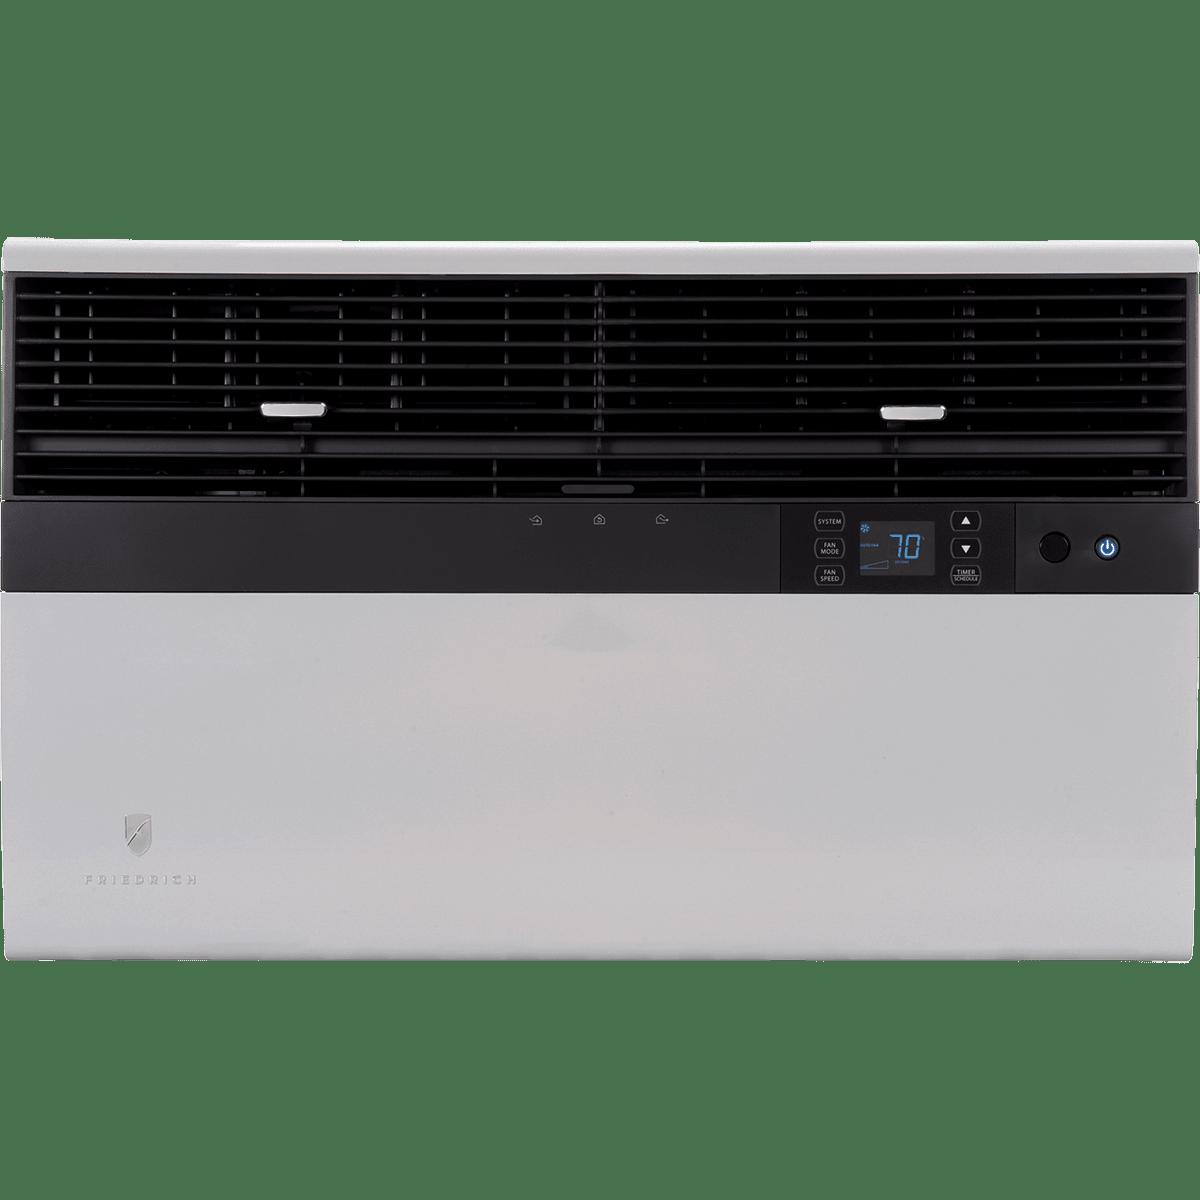 Friedrich Kuhl YM18N34C 18000 BTU Window Air Conditioner with Heat Pump